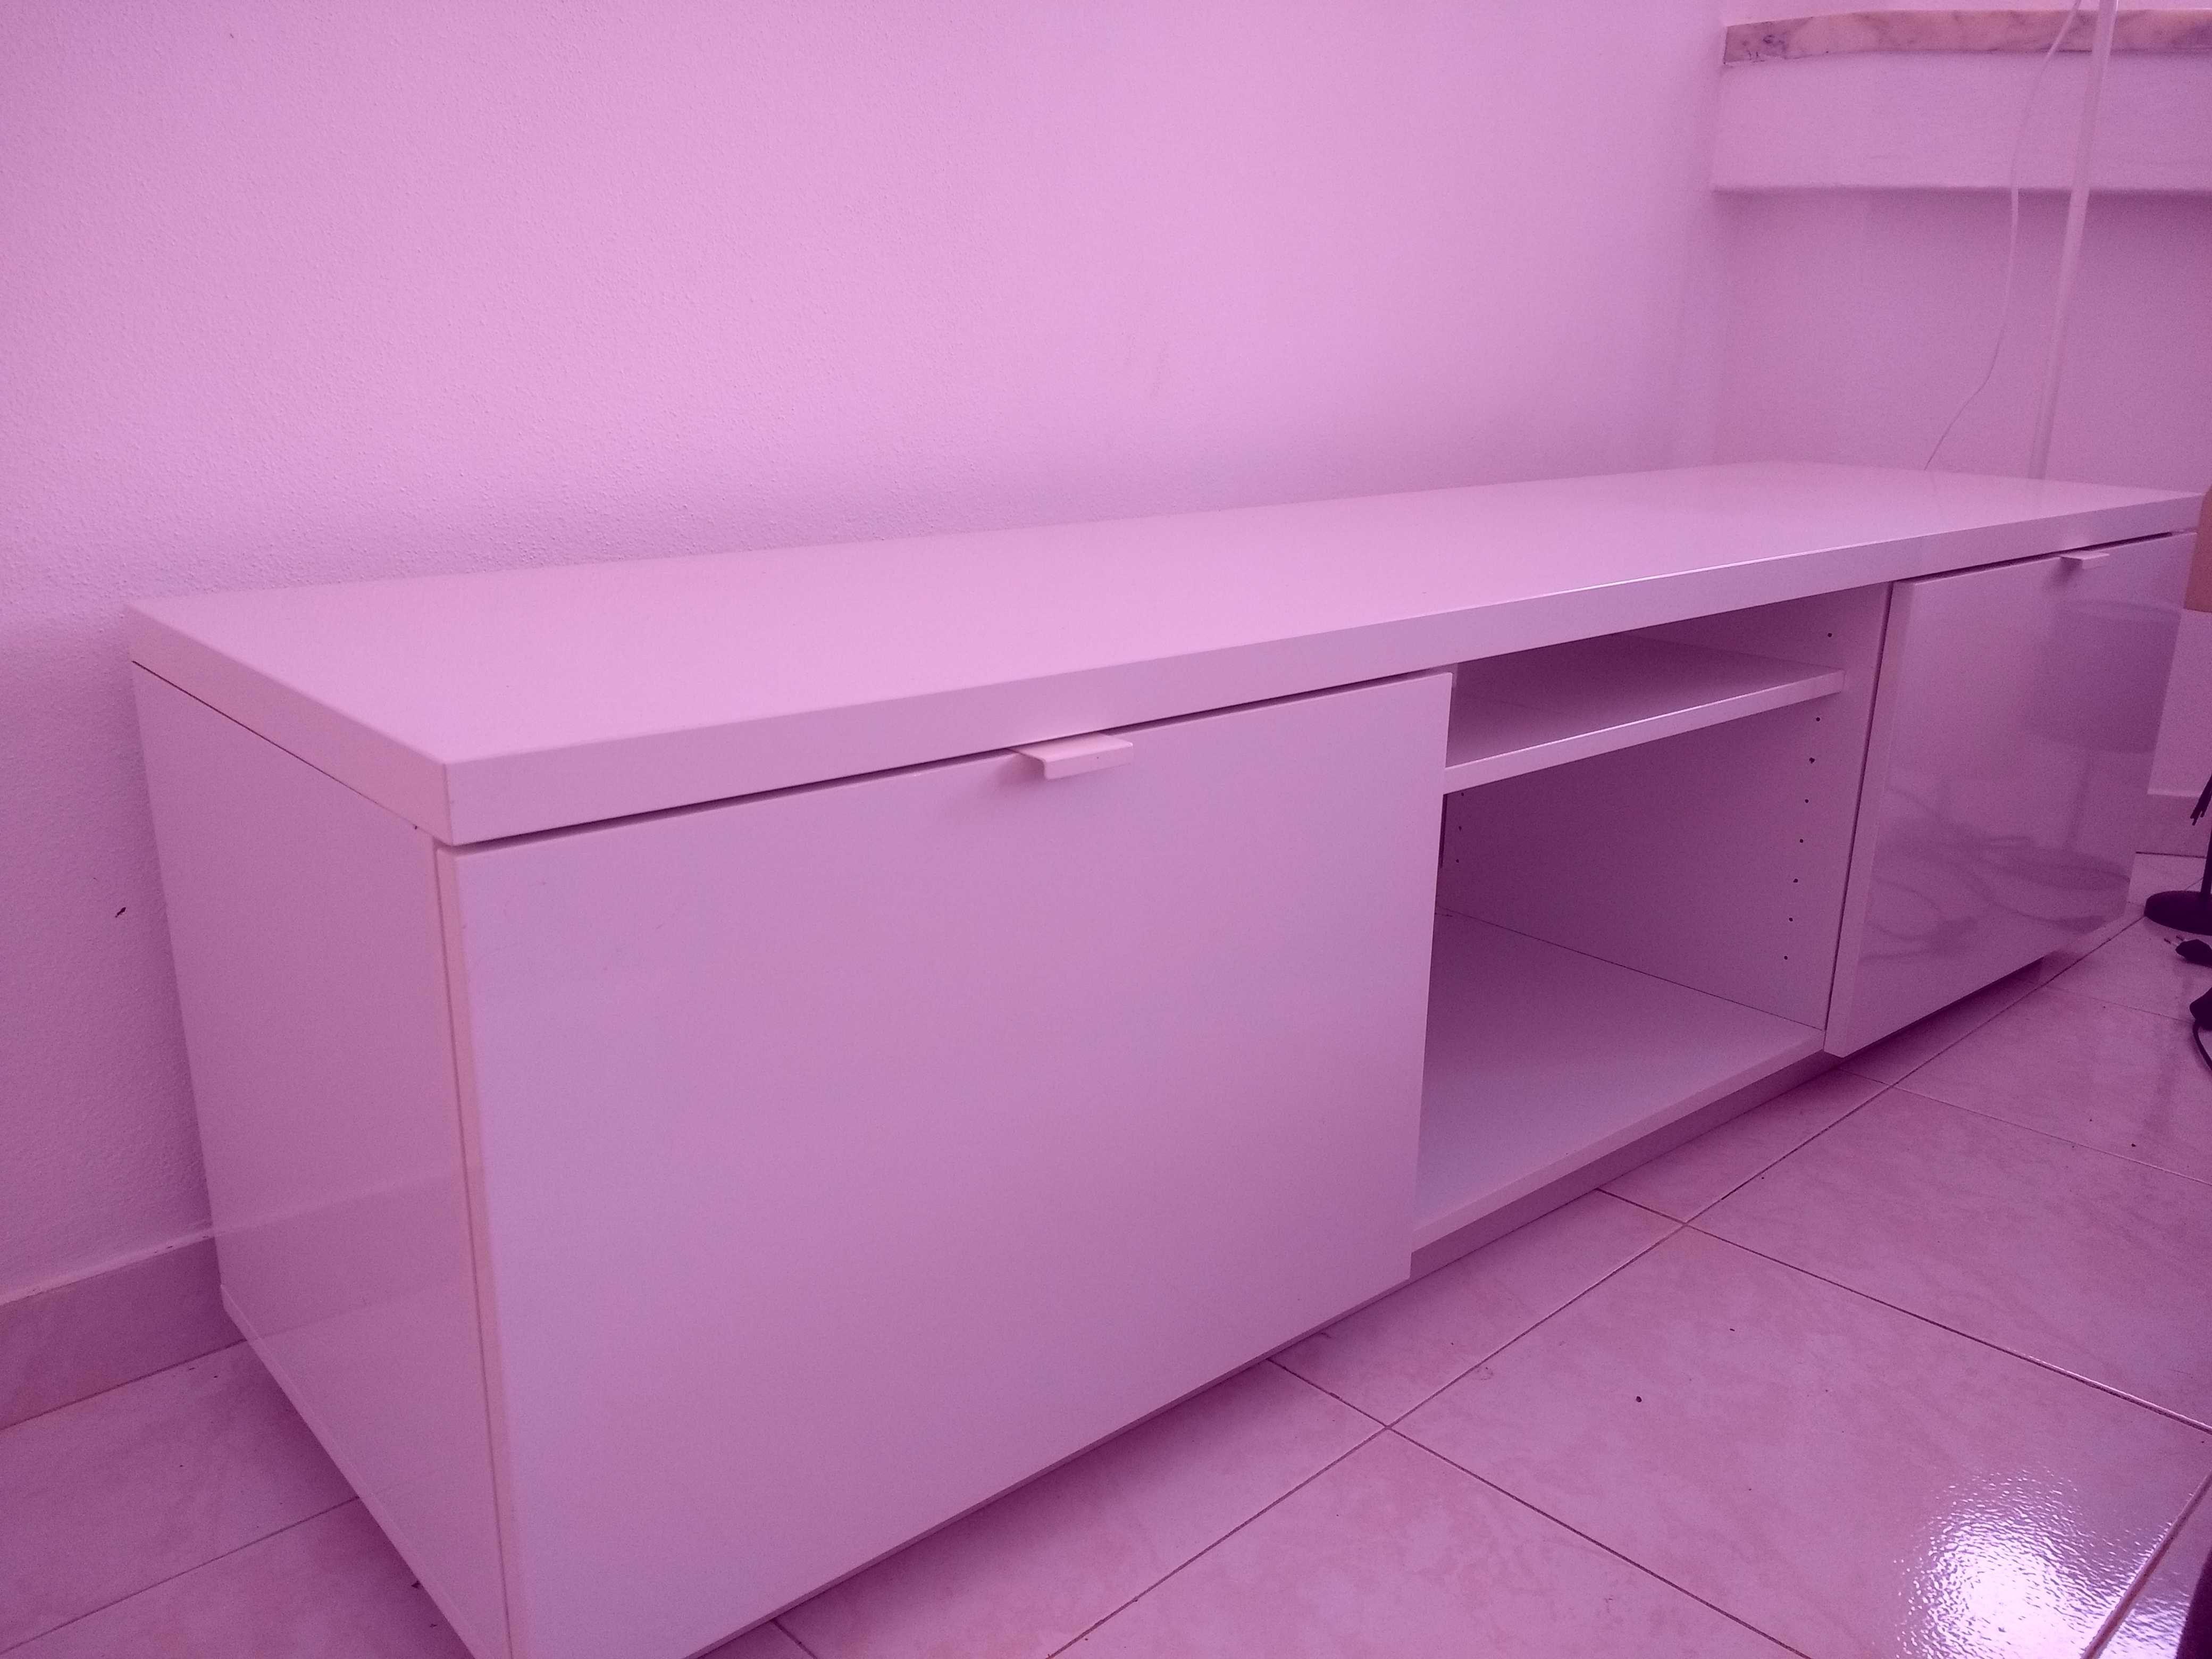 Móvel de TV / TV unit stand